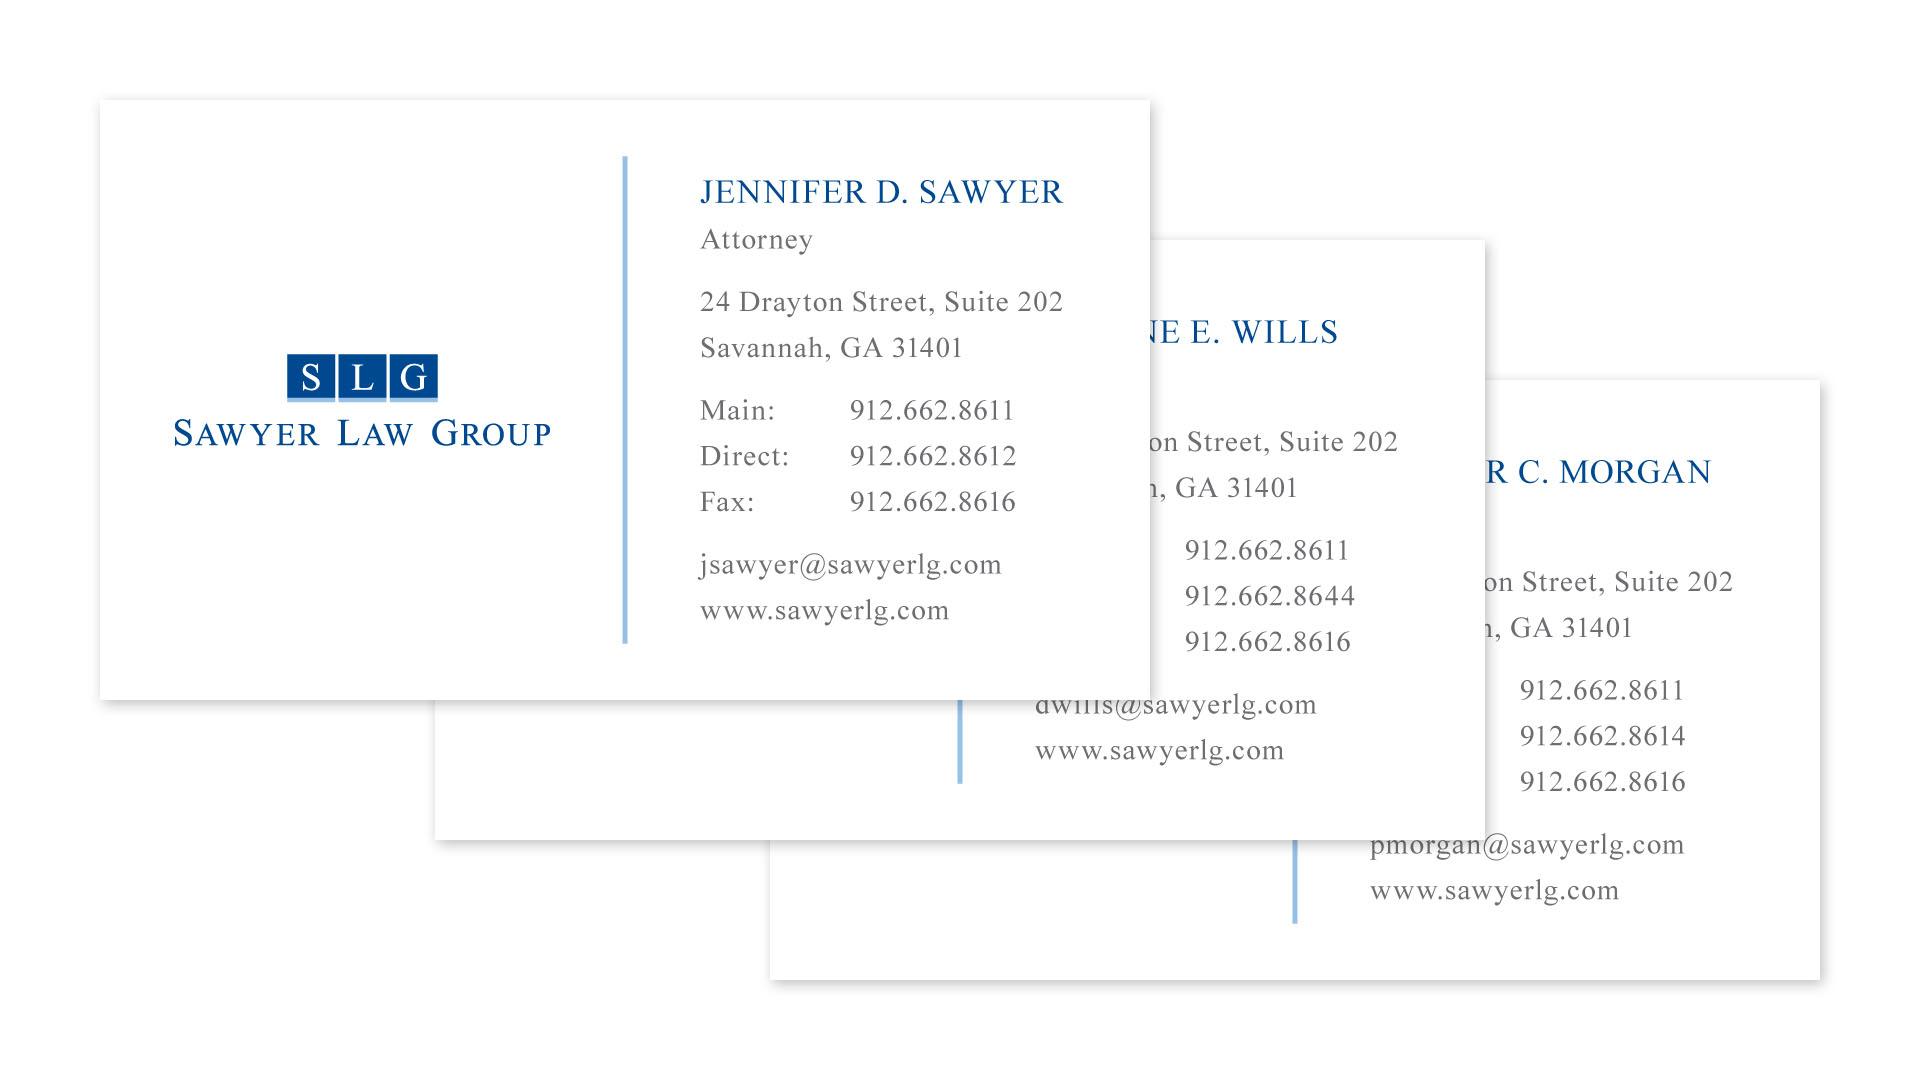 Speros Graphic Design - Sawyer Law Group